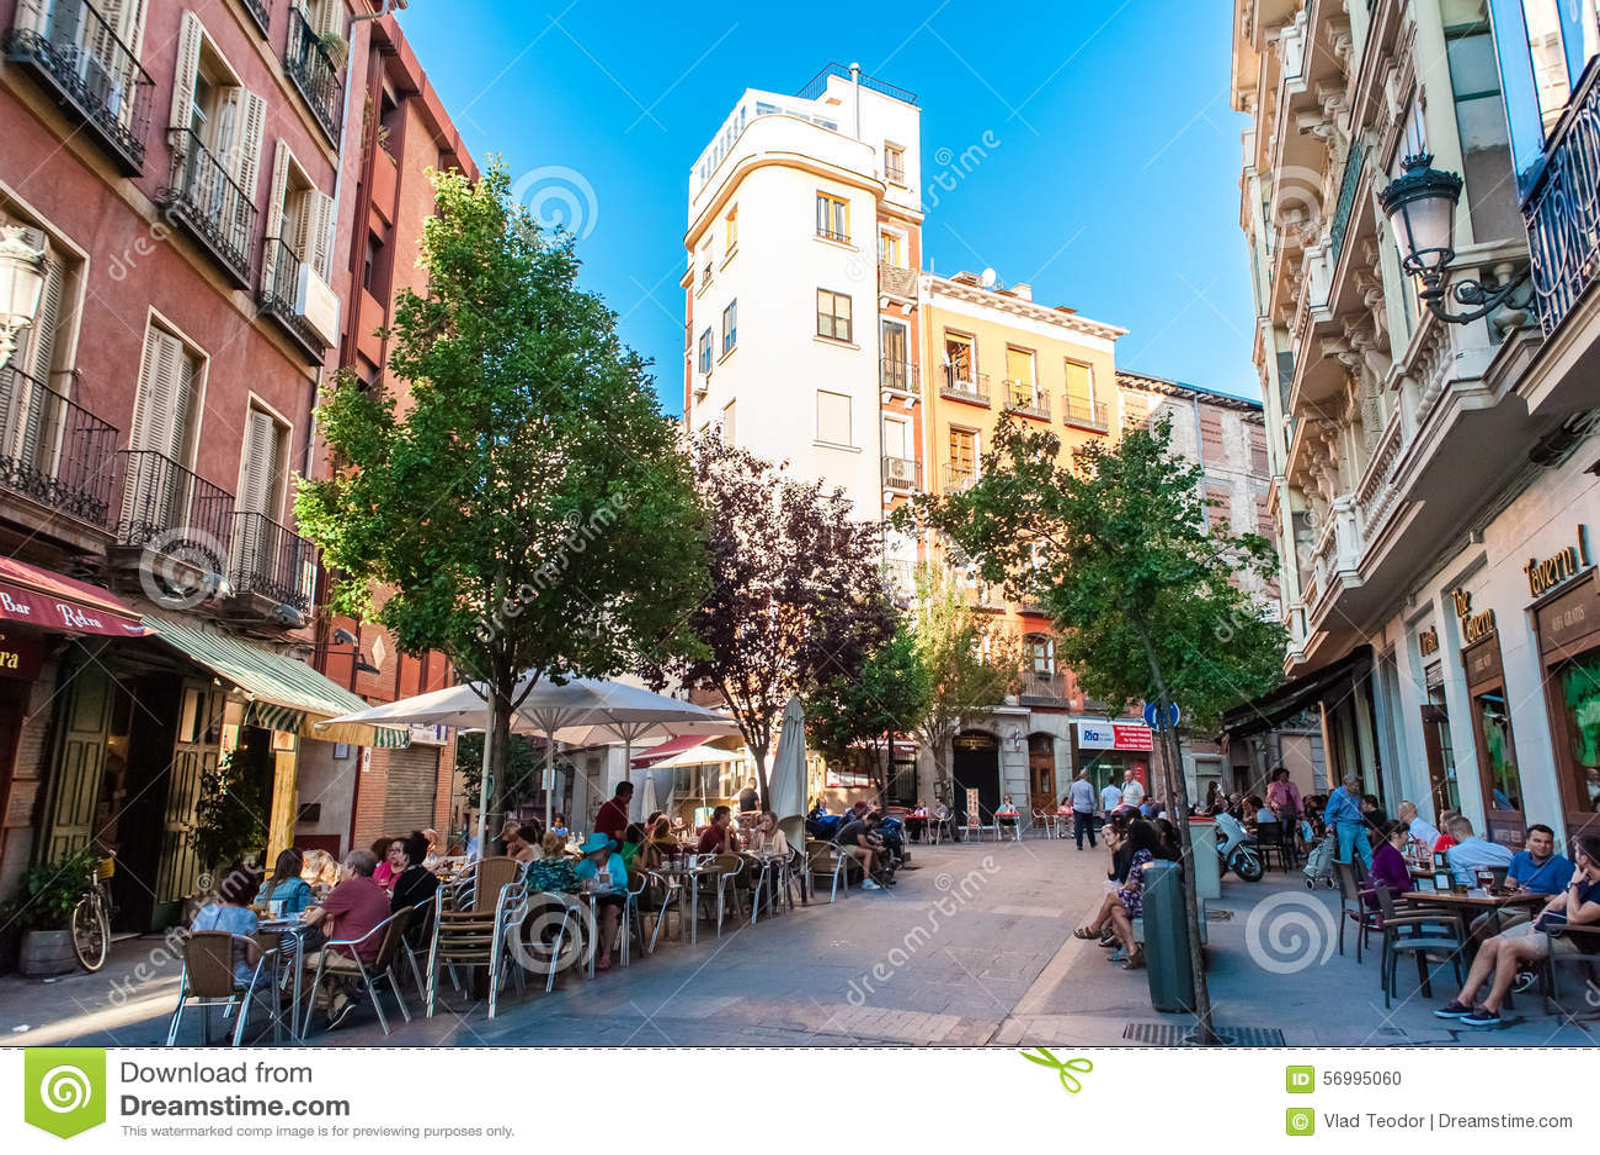 MADRID SPAIN - JUNE 23, 2015: Plaza de San Miguel